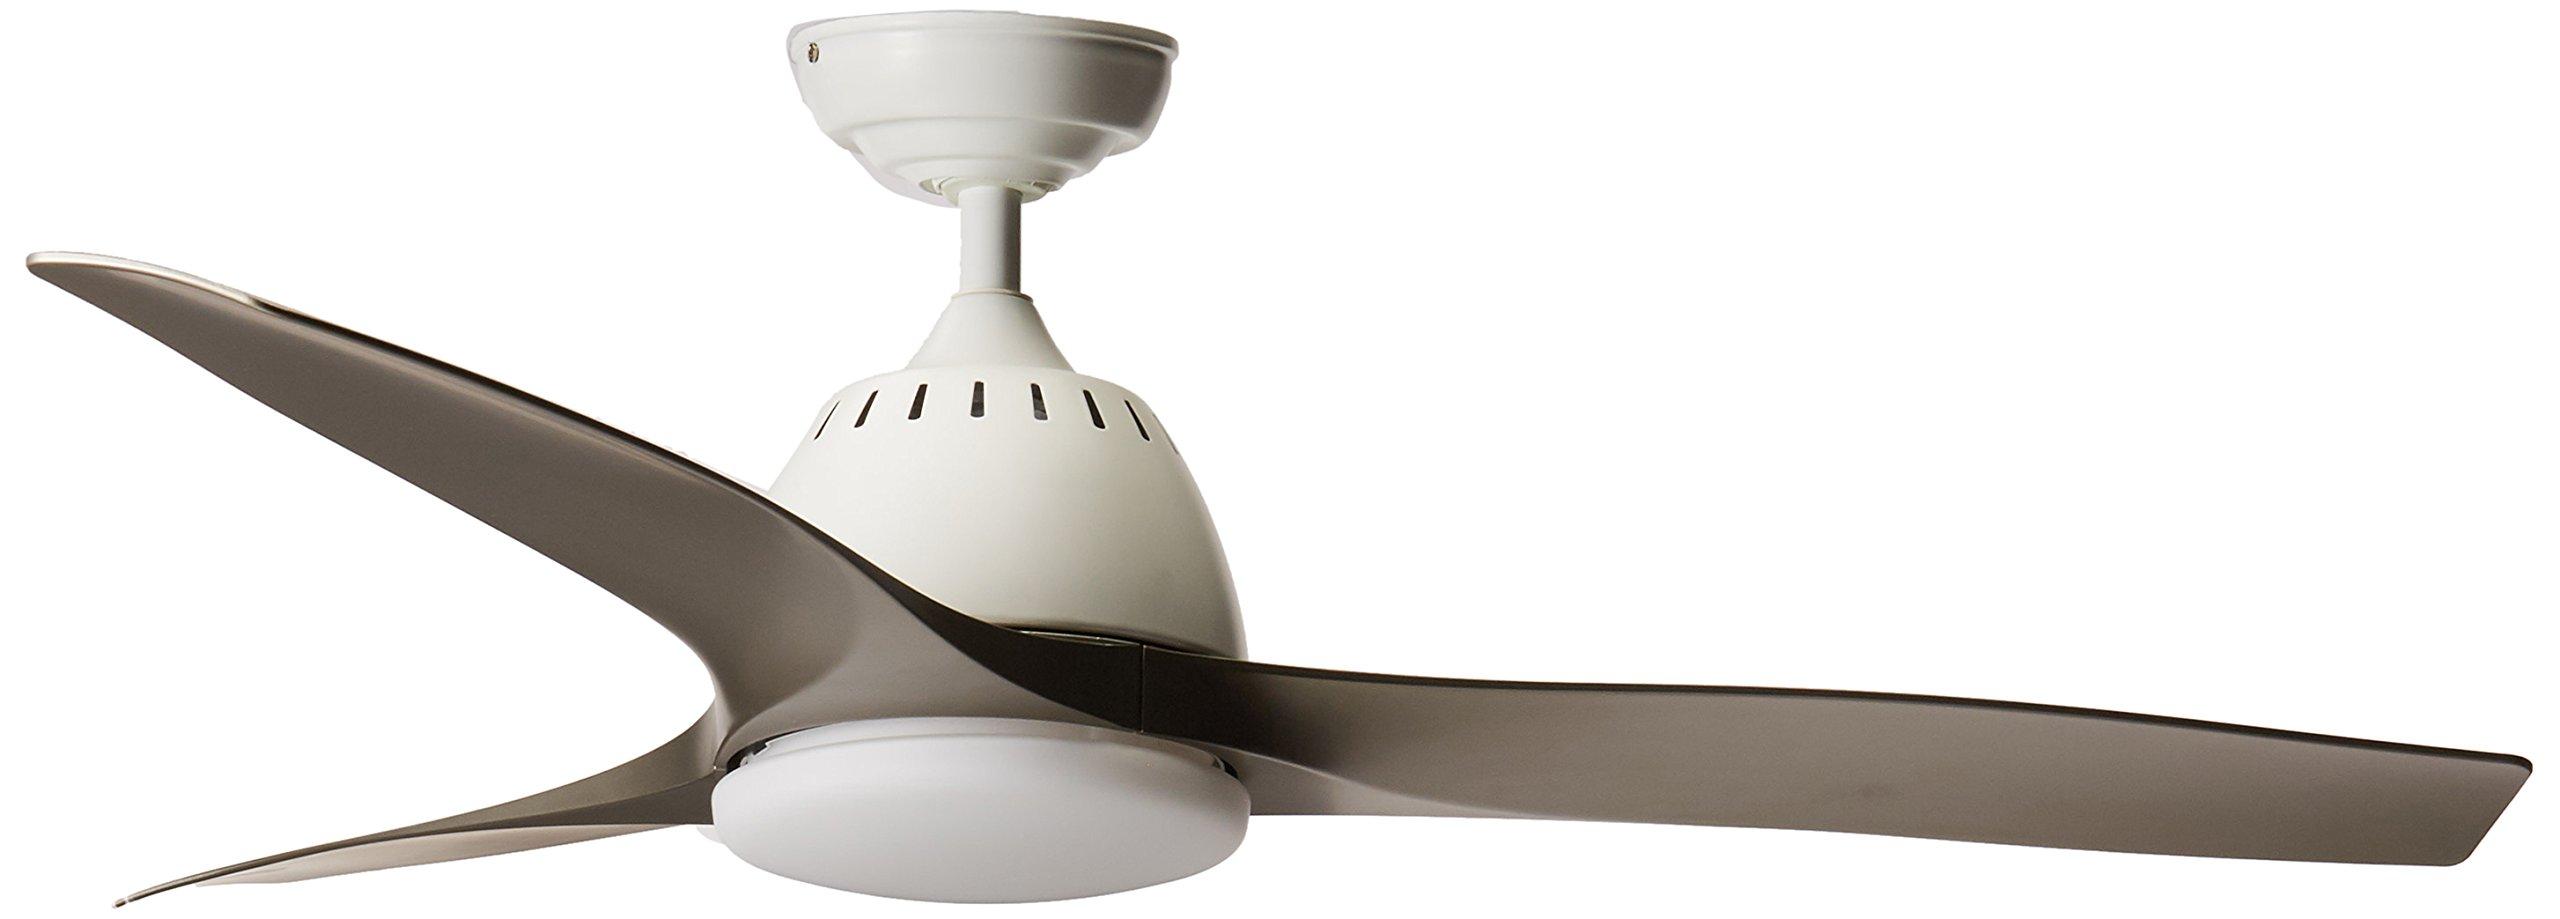 Casablanca 59151 Wisp Indoor Ceiling Fan with Remote, Medium, Fresh White